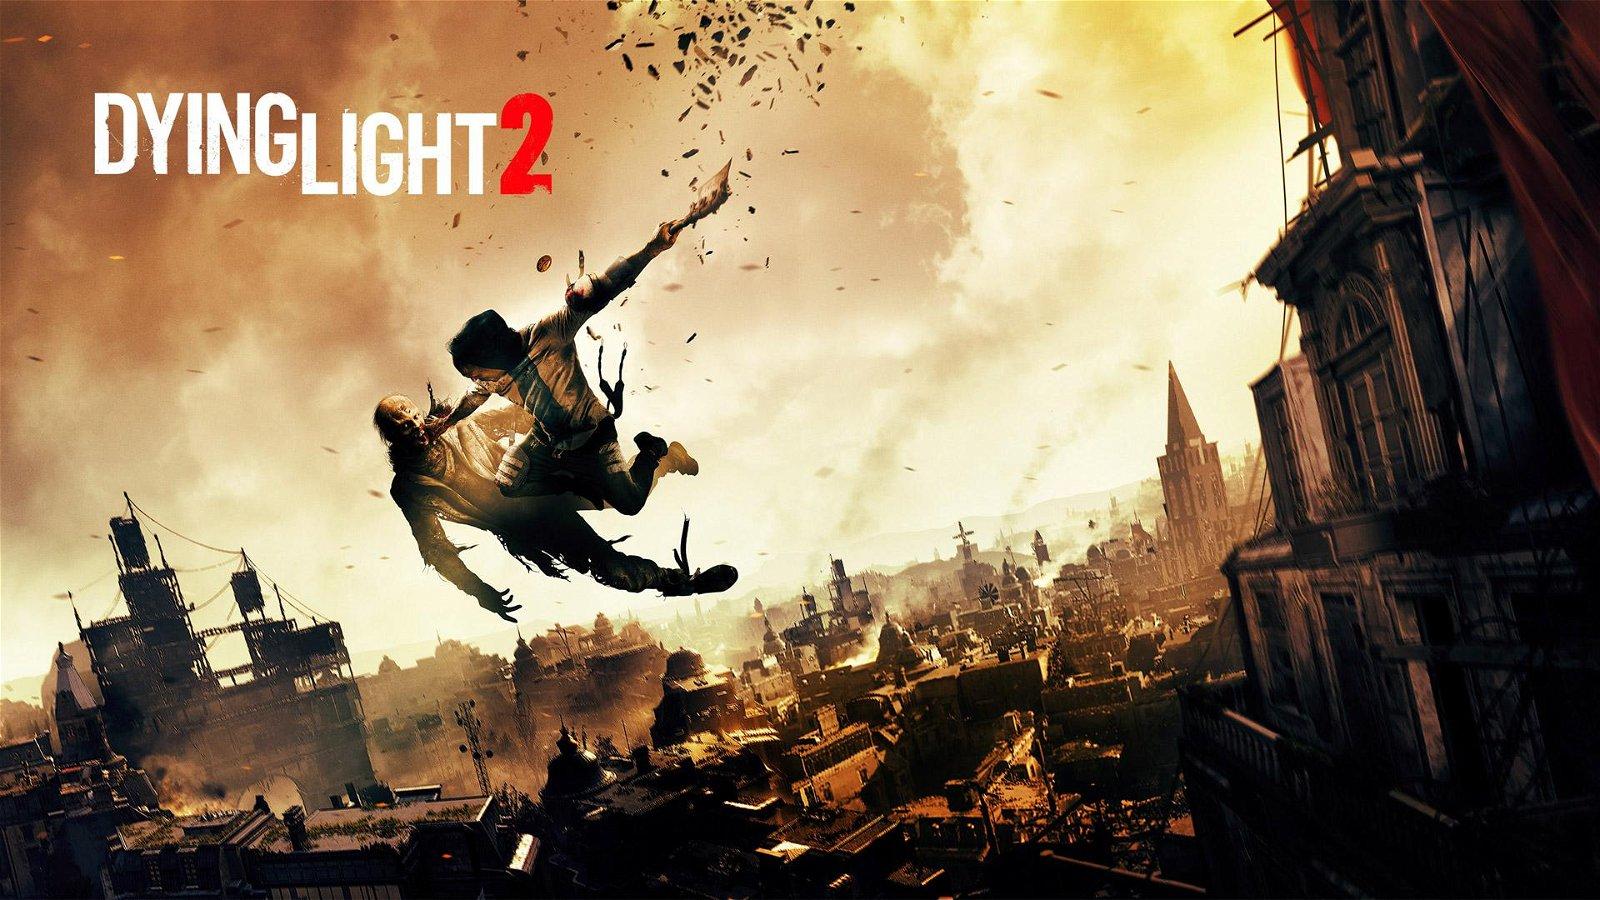 Update: Dying Light 2 Developer Update Coming Next Week, New July Steam Announced